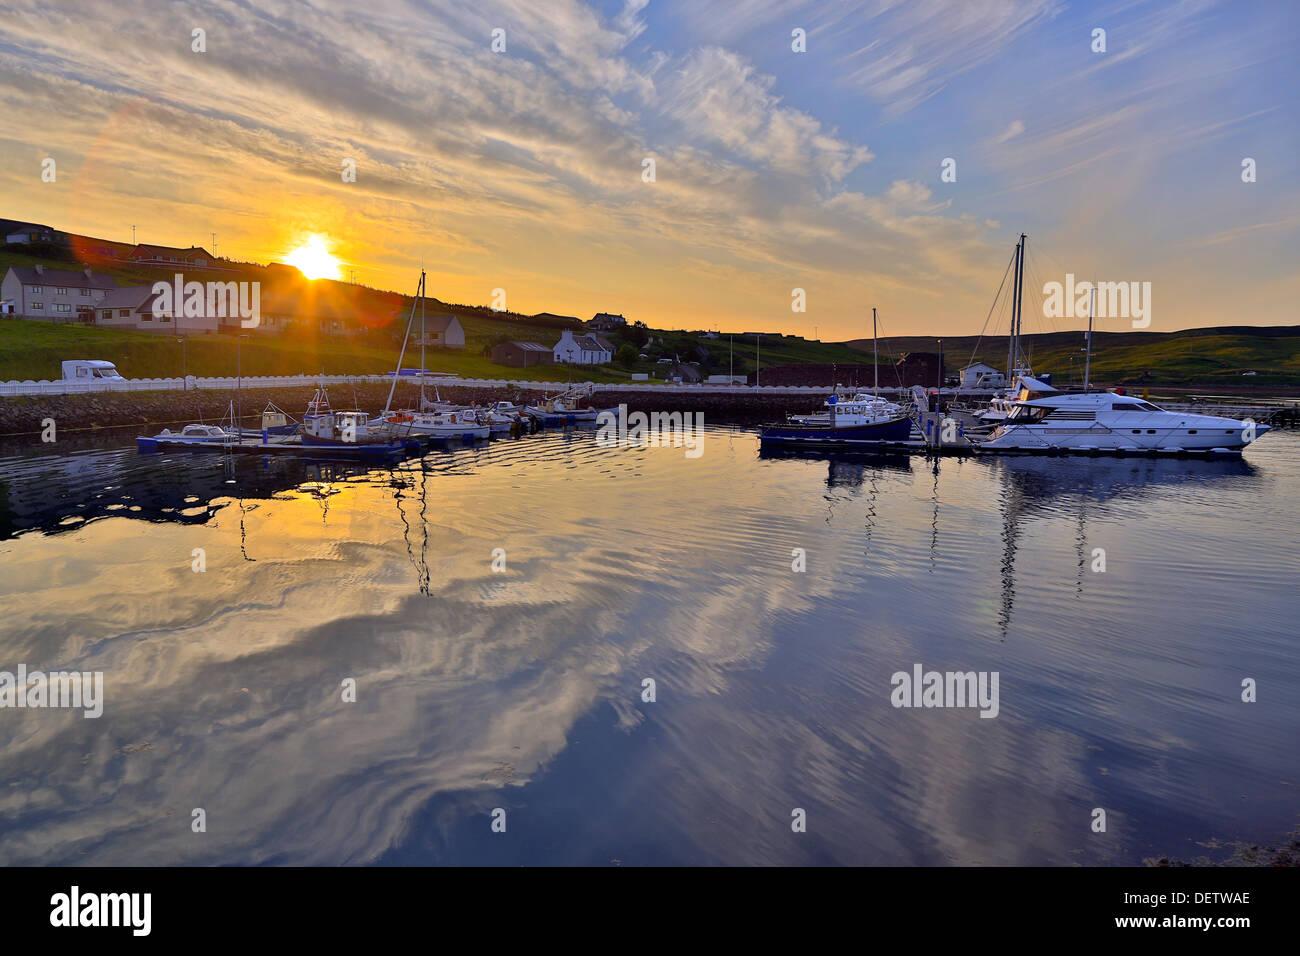 Skeld Harbour and Campsite; Shetland; UK - Stock Image